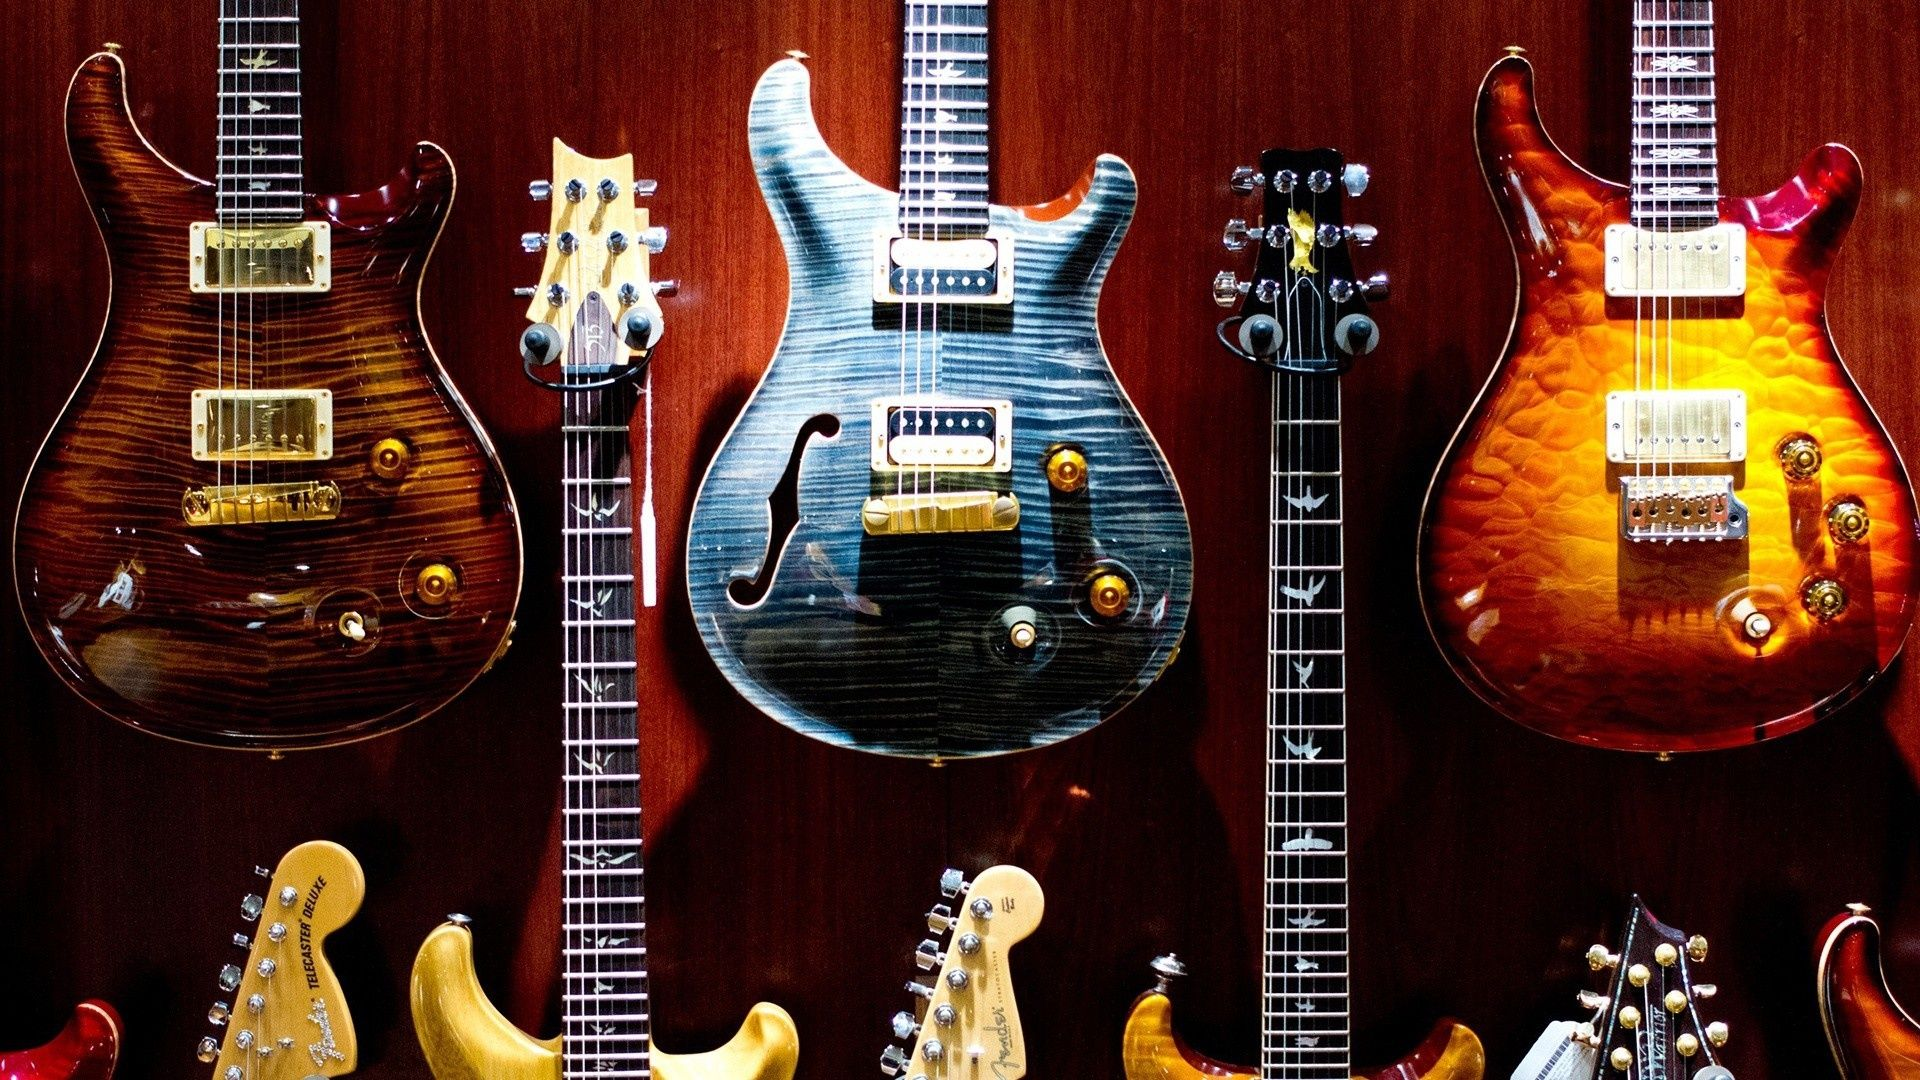 Fender Guitar, New Wallpaper